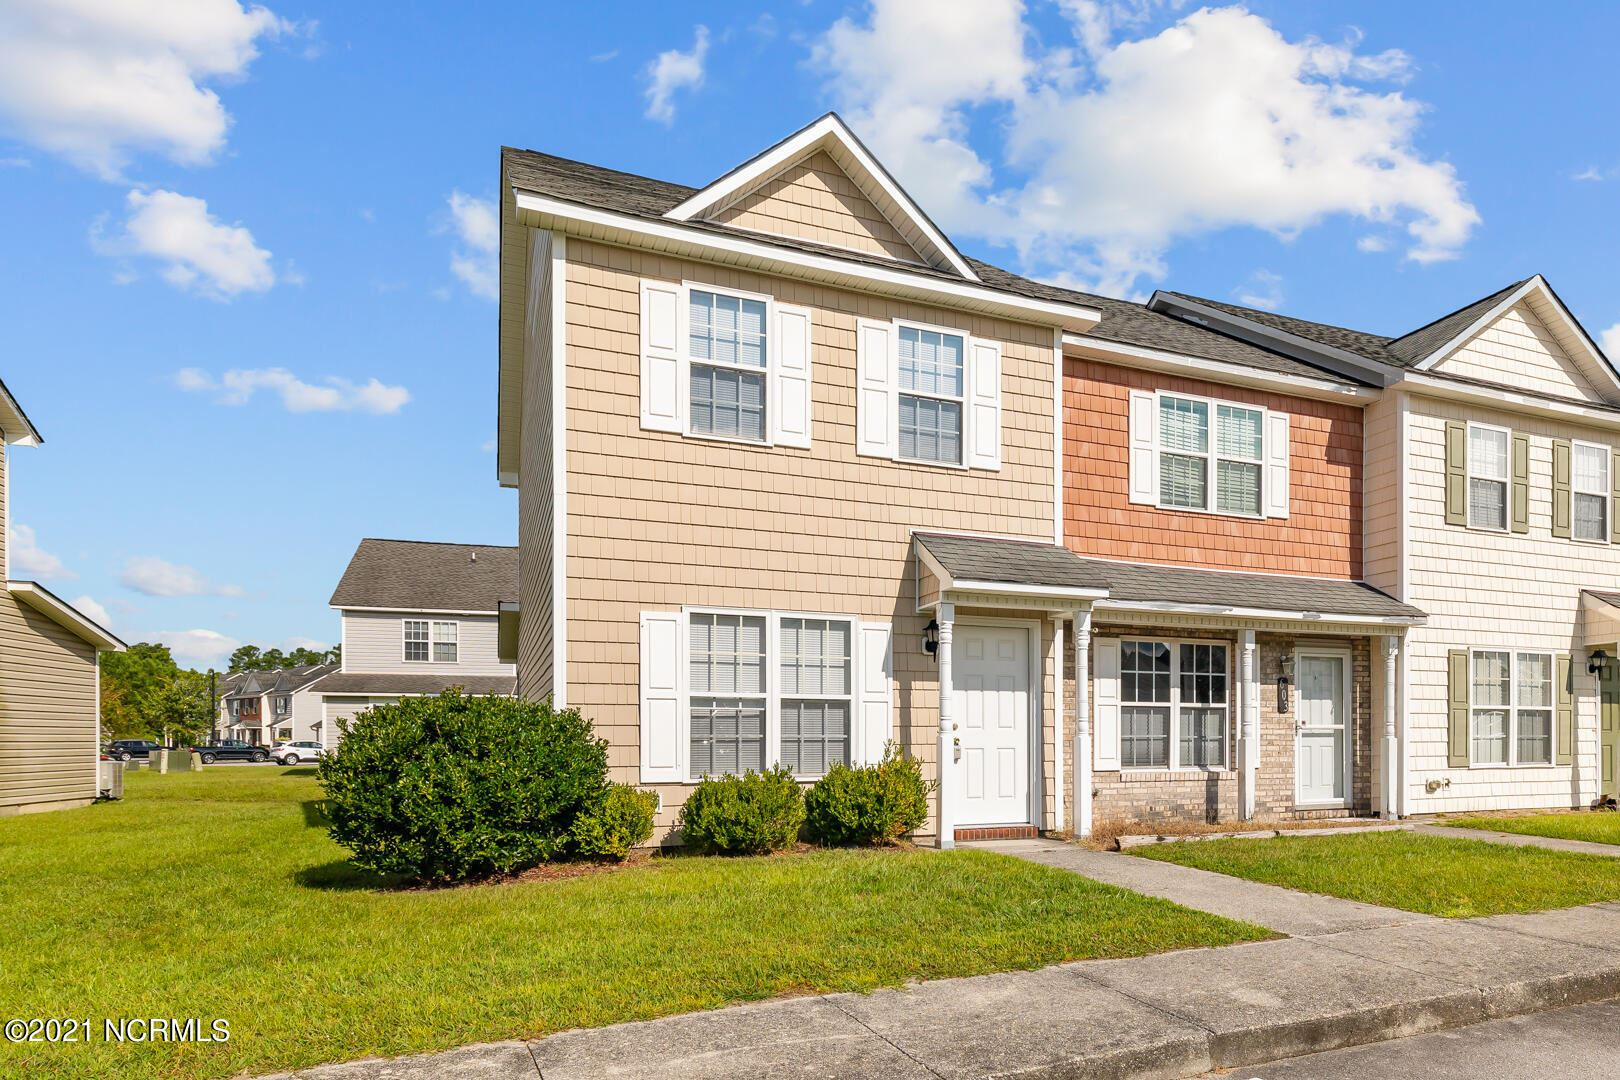 Photo of 601 Streamwood Drive, Jacksonville, NC 28546 (MLS # 100291281)